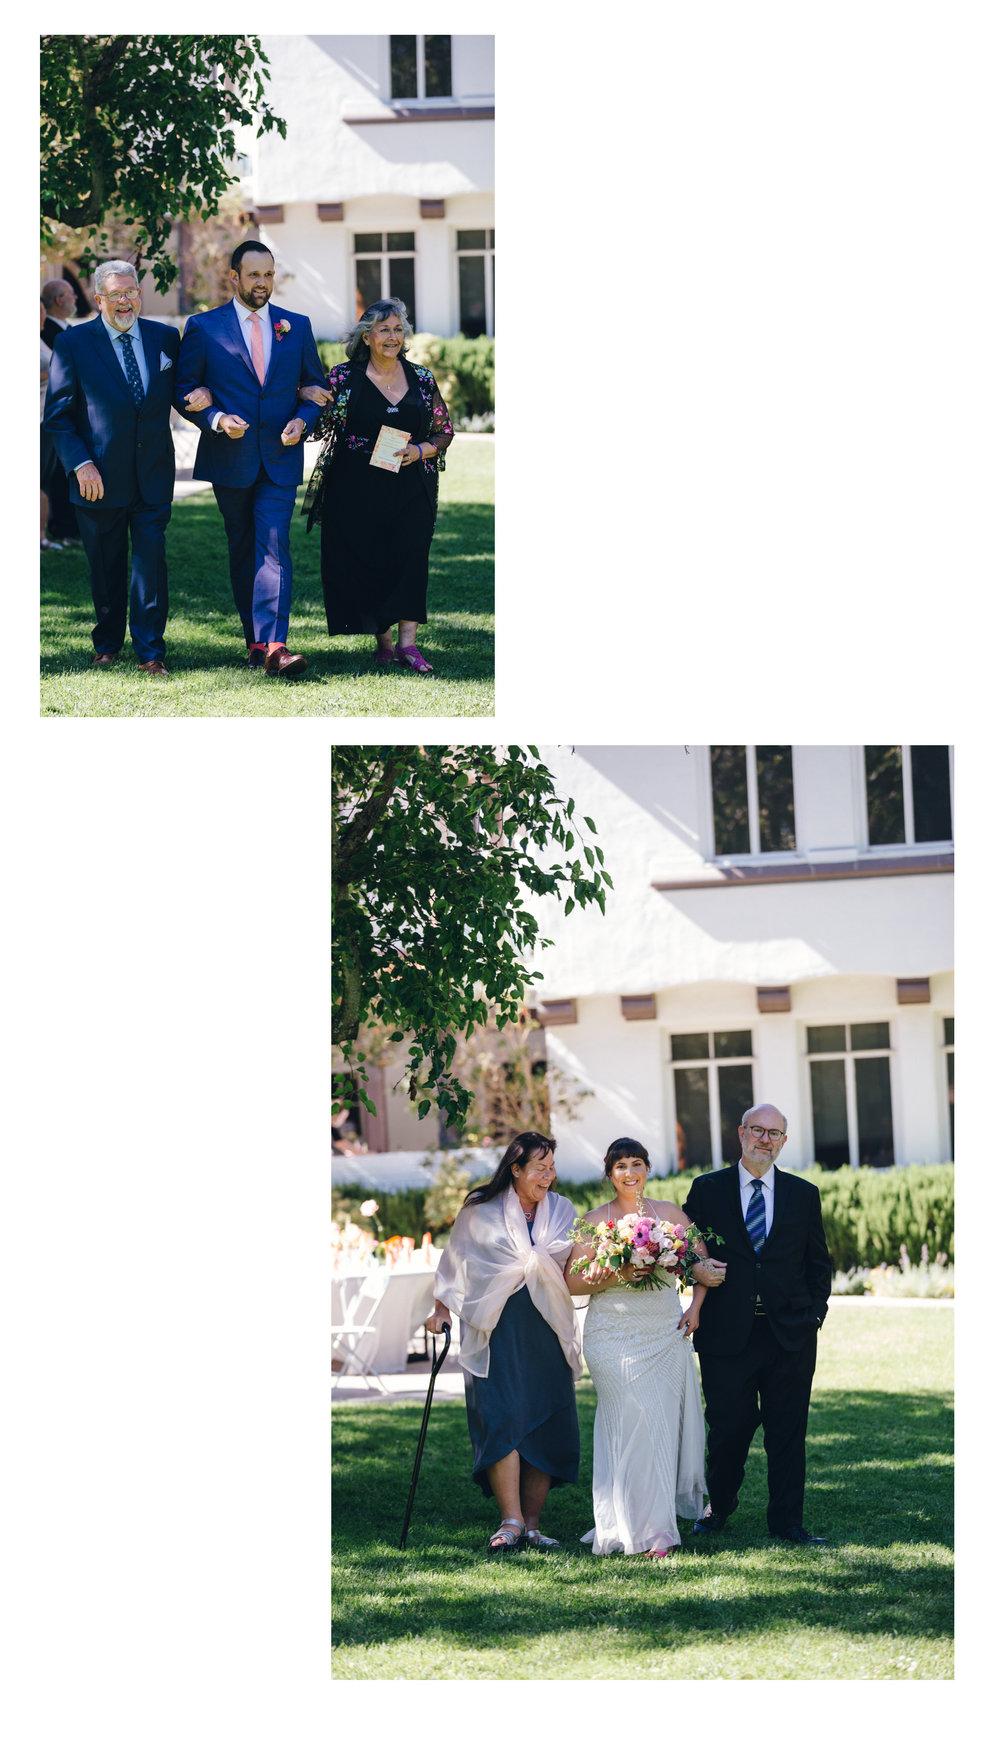 IG_wedding (29 of 110) copy.jpg